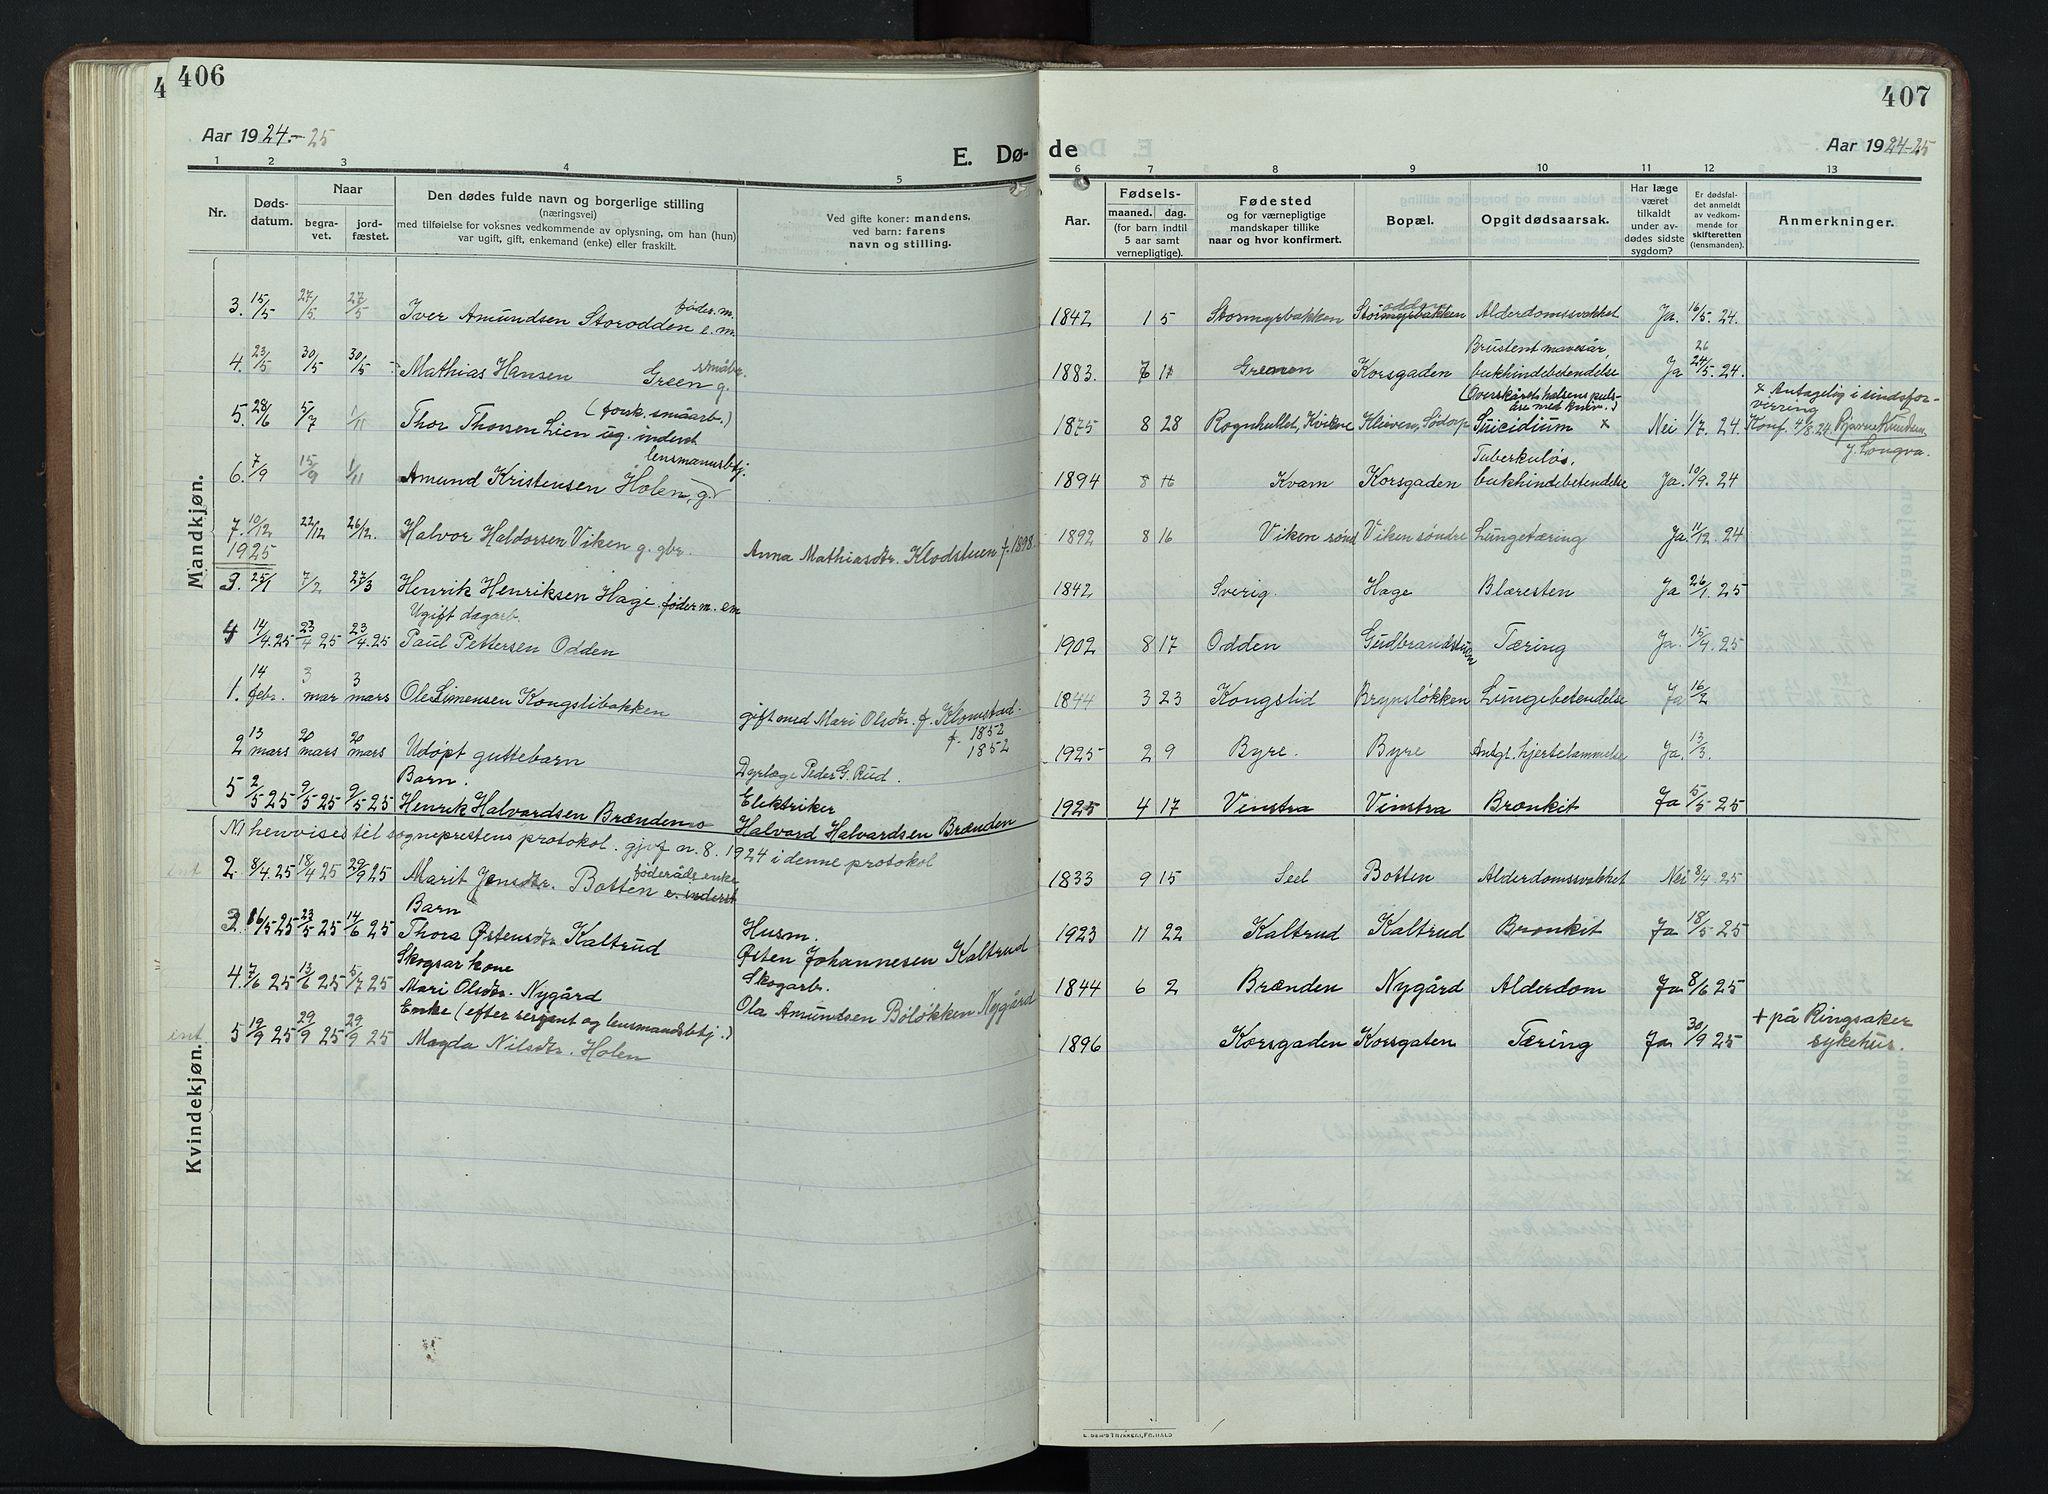 SAH, Nord-Fron prestekontor, Klokkerbok nr. 7, 1915-1946, s. 406-407